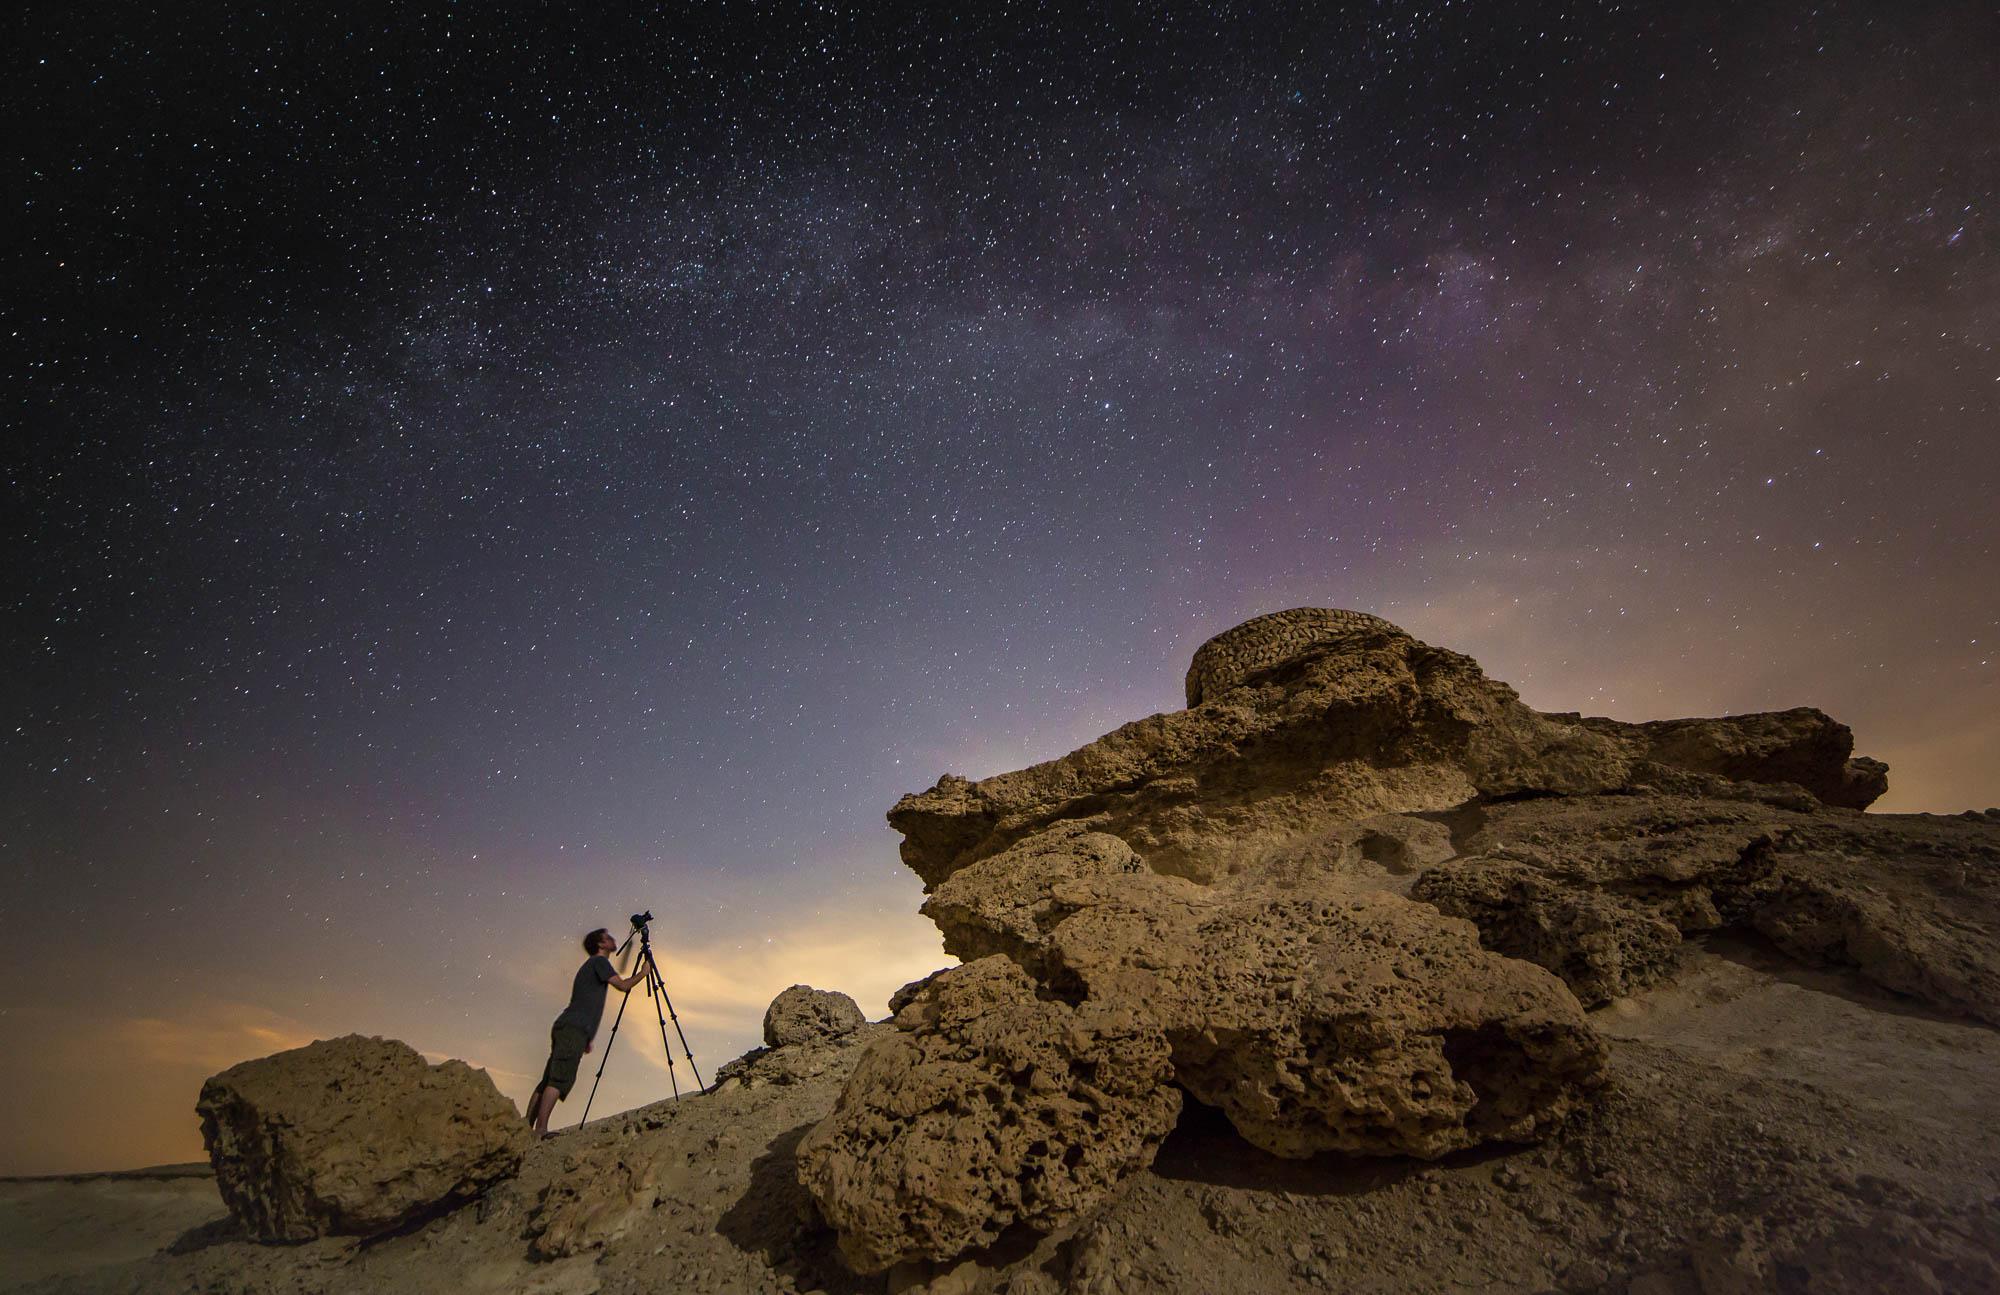 Photographer capturing the night sky